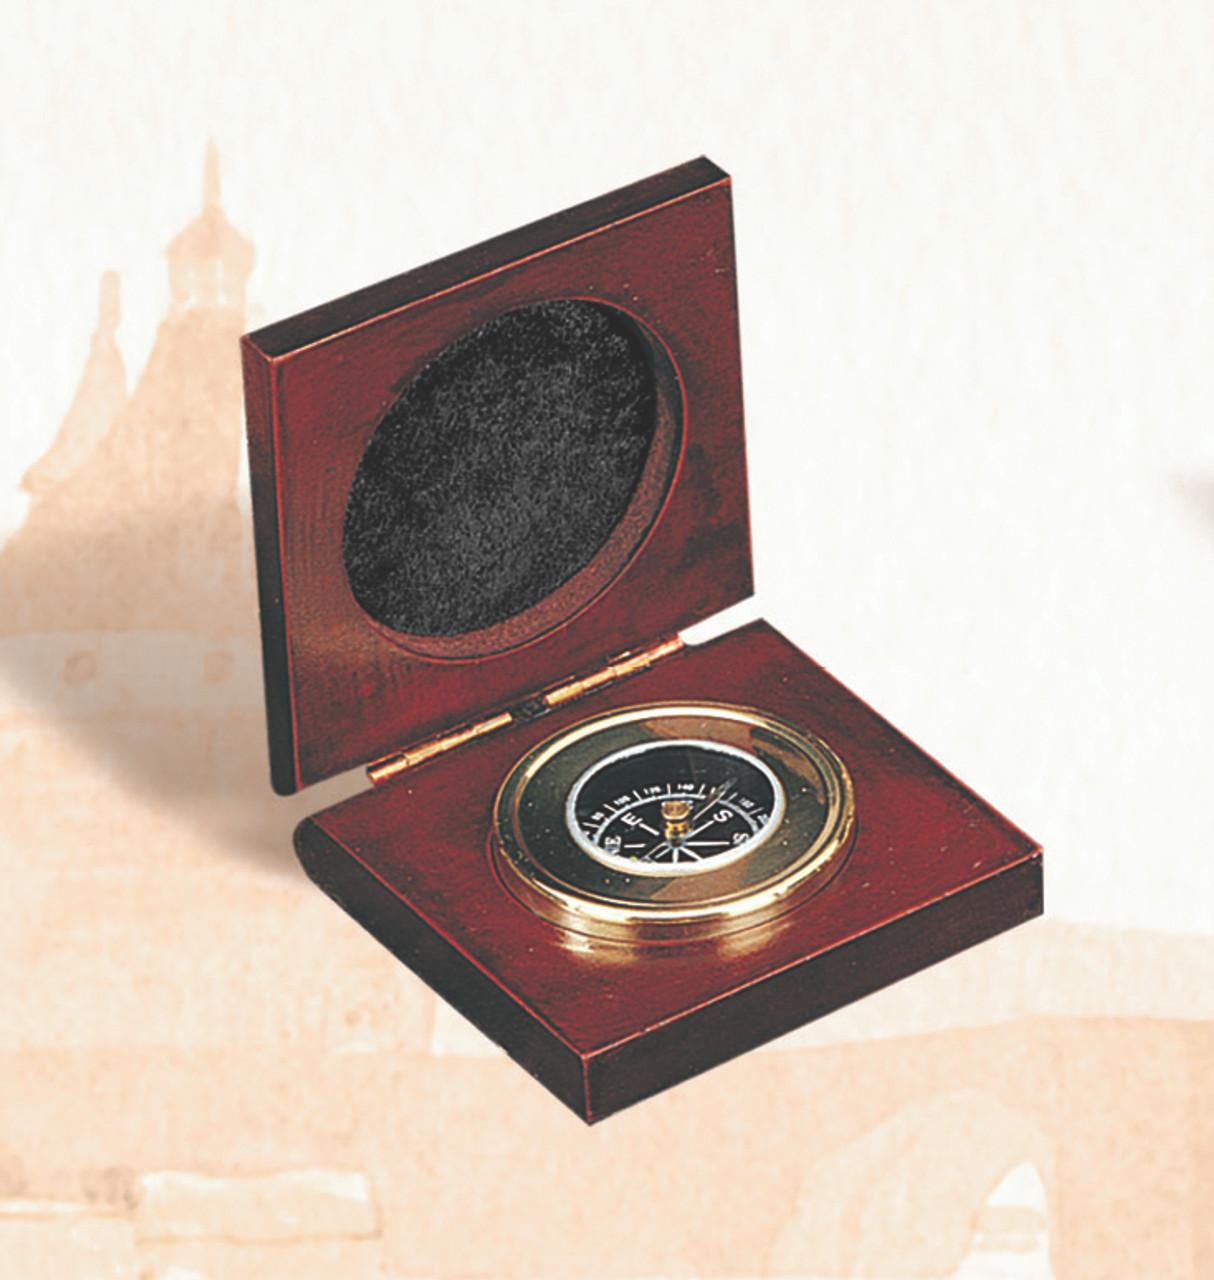 "(BW-665) 2.5"" Executive Desk Compass with Mahogany Case"